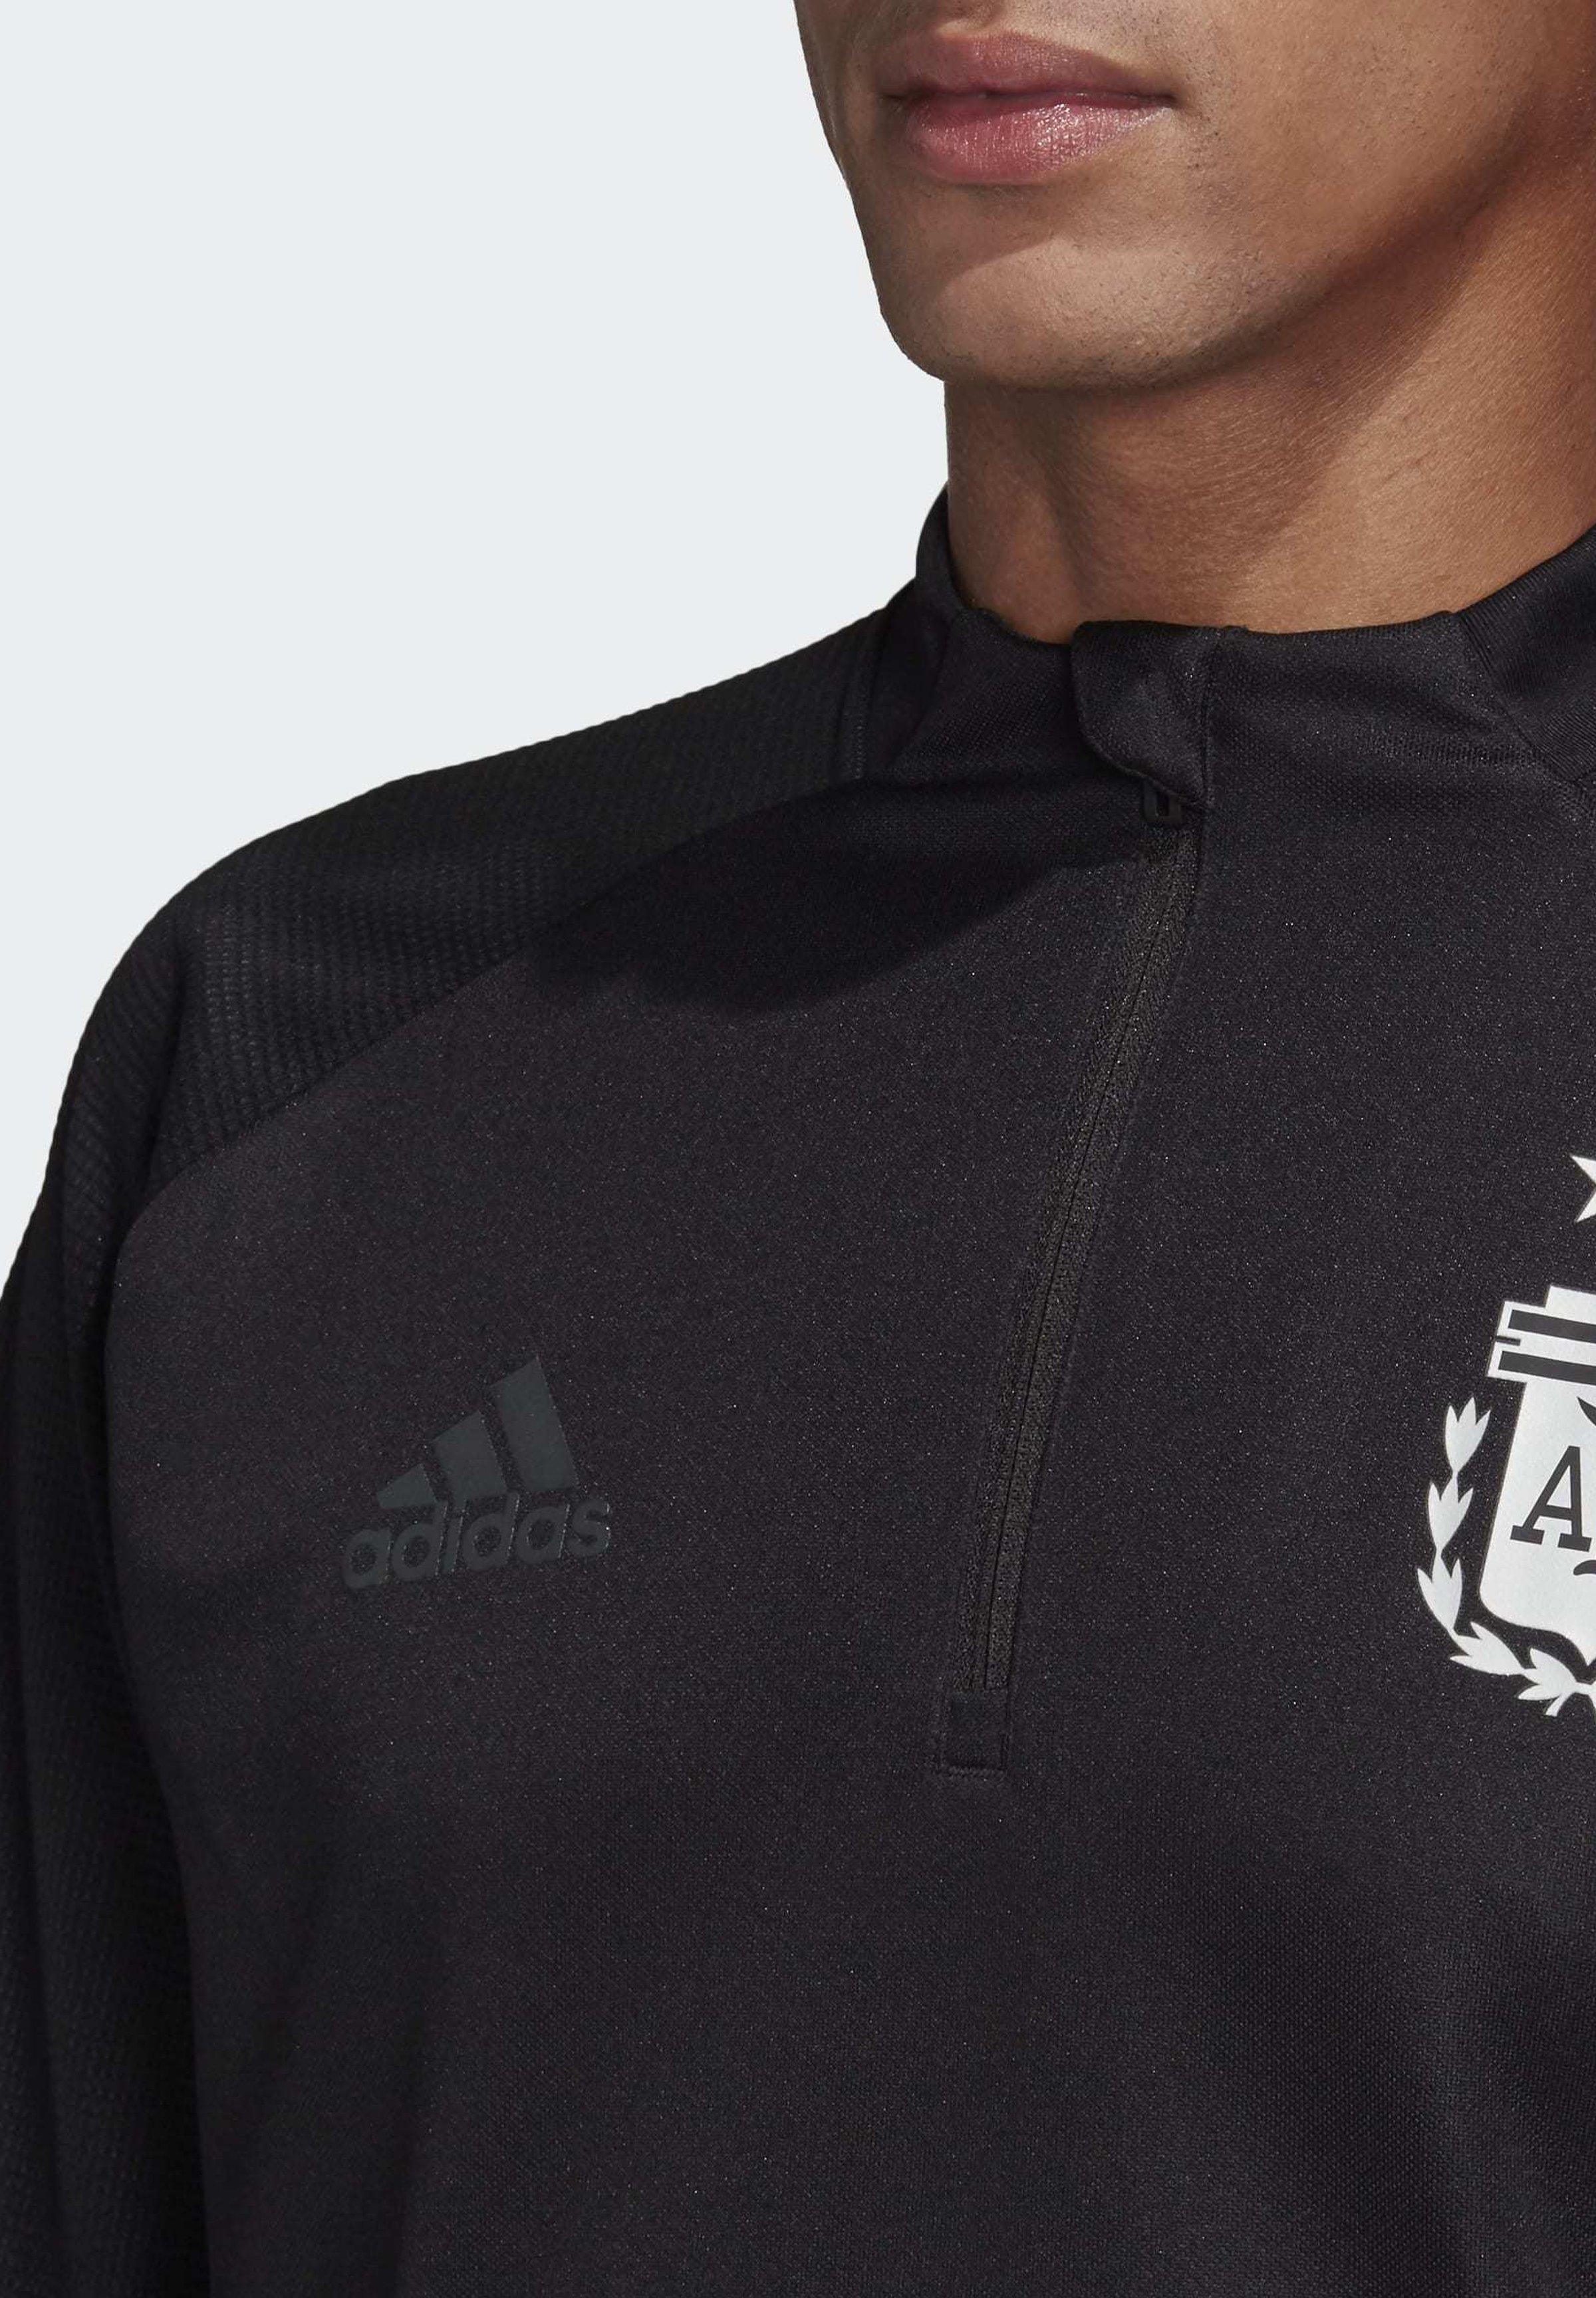 Adidas Performance Argentina Training Top - Nationalmannschaft Black Friday